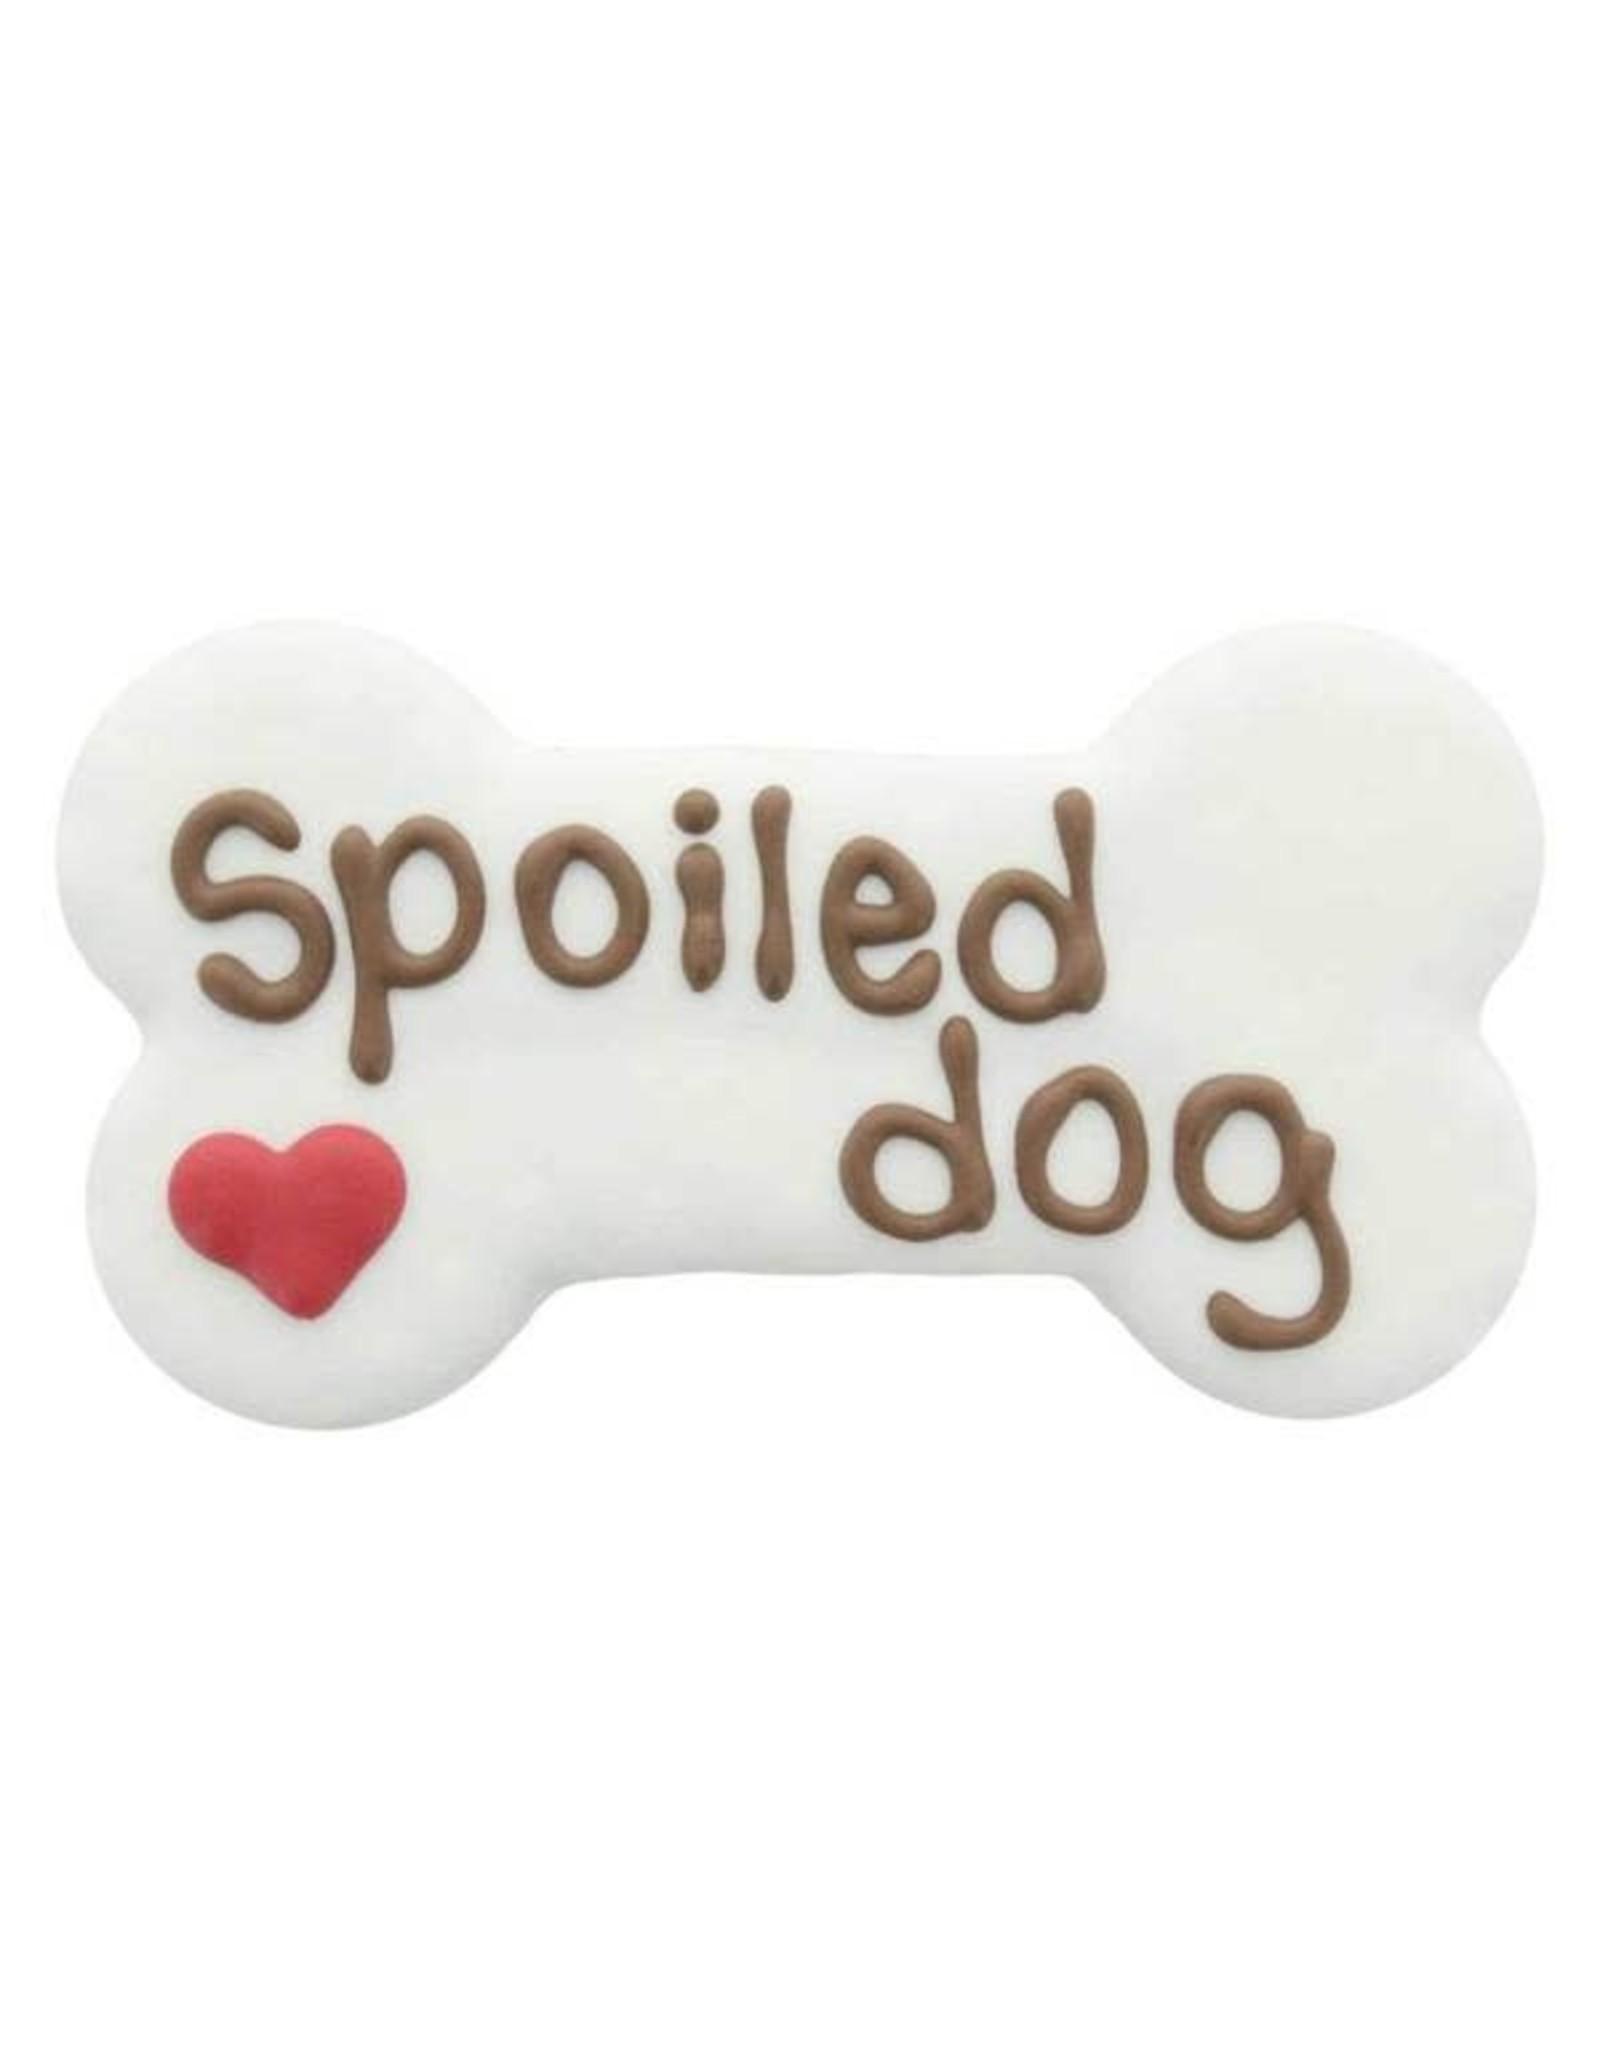 Bosco & Roxy's Bosco & Roxy's - Spoiled Dog Bone